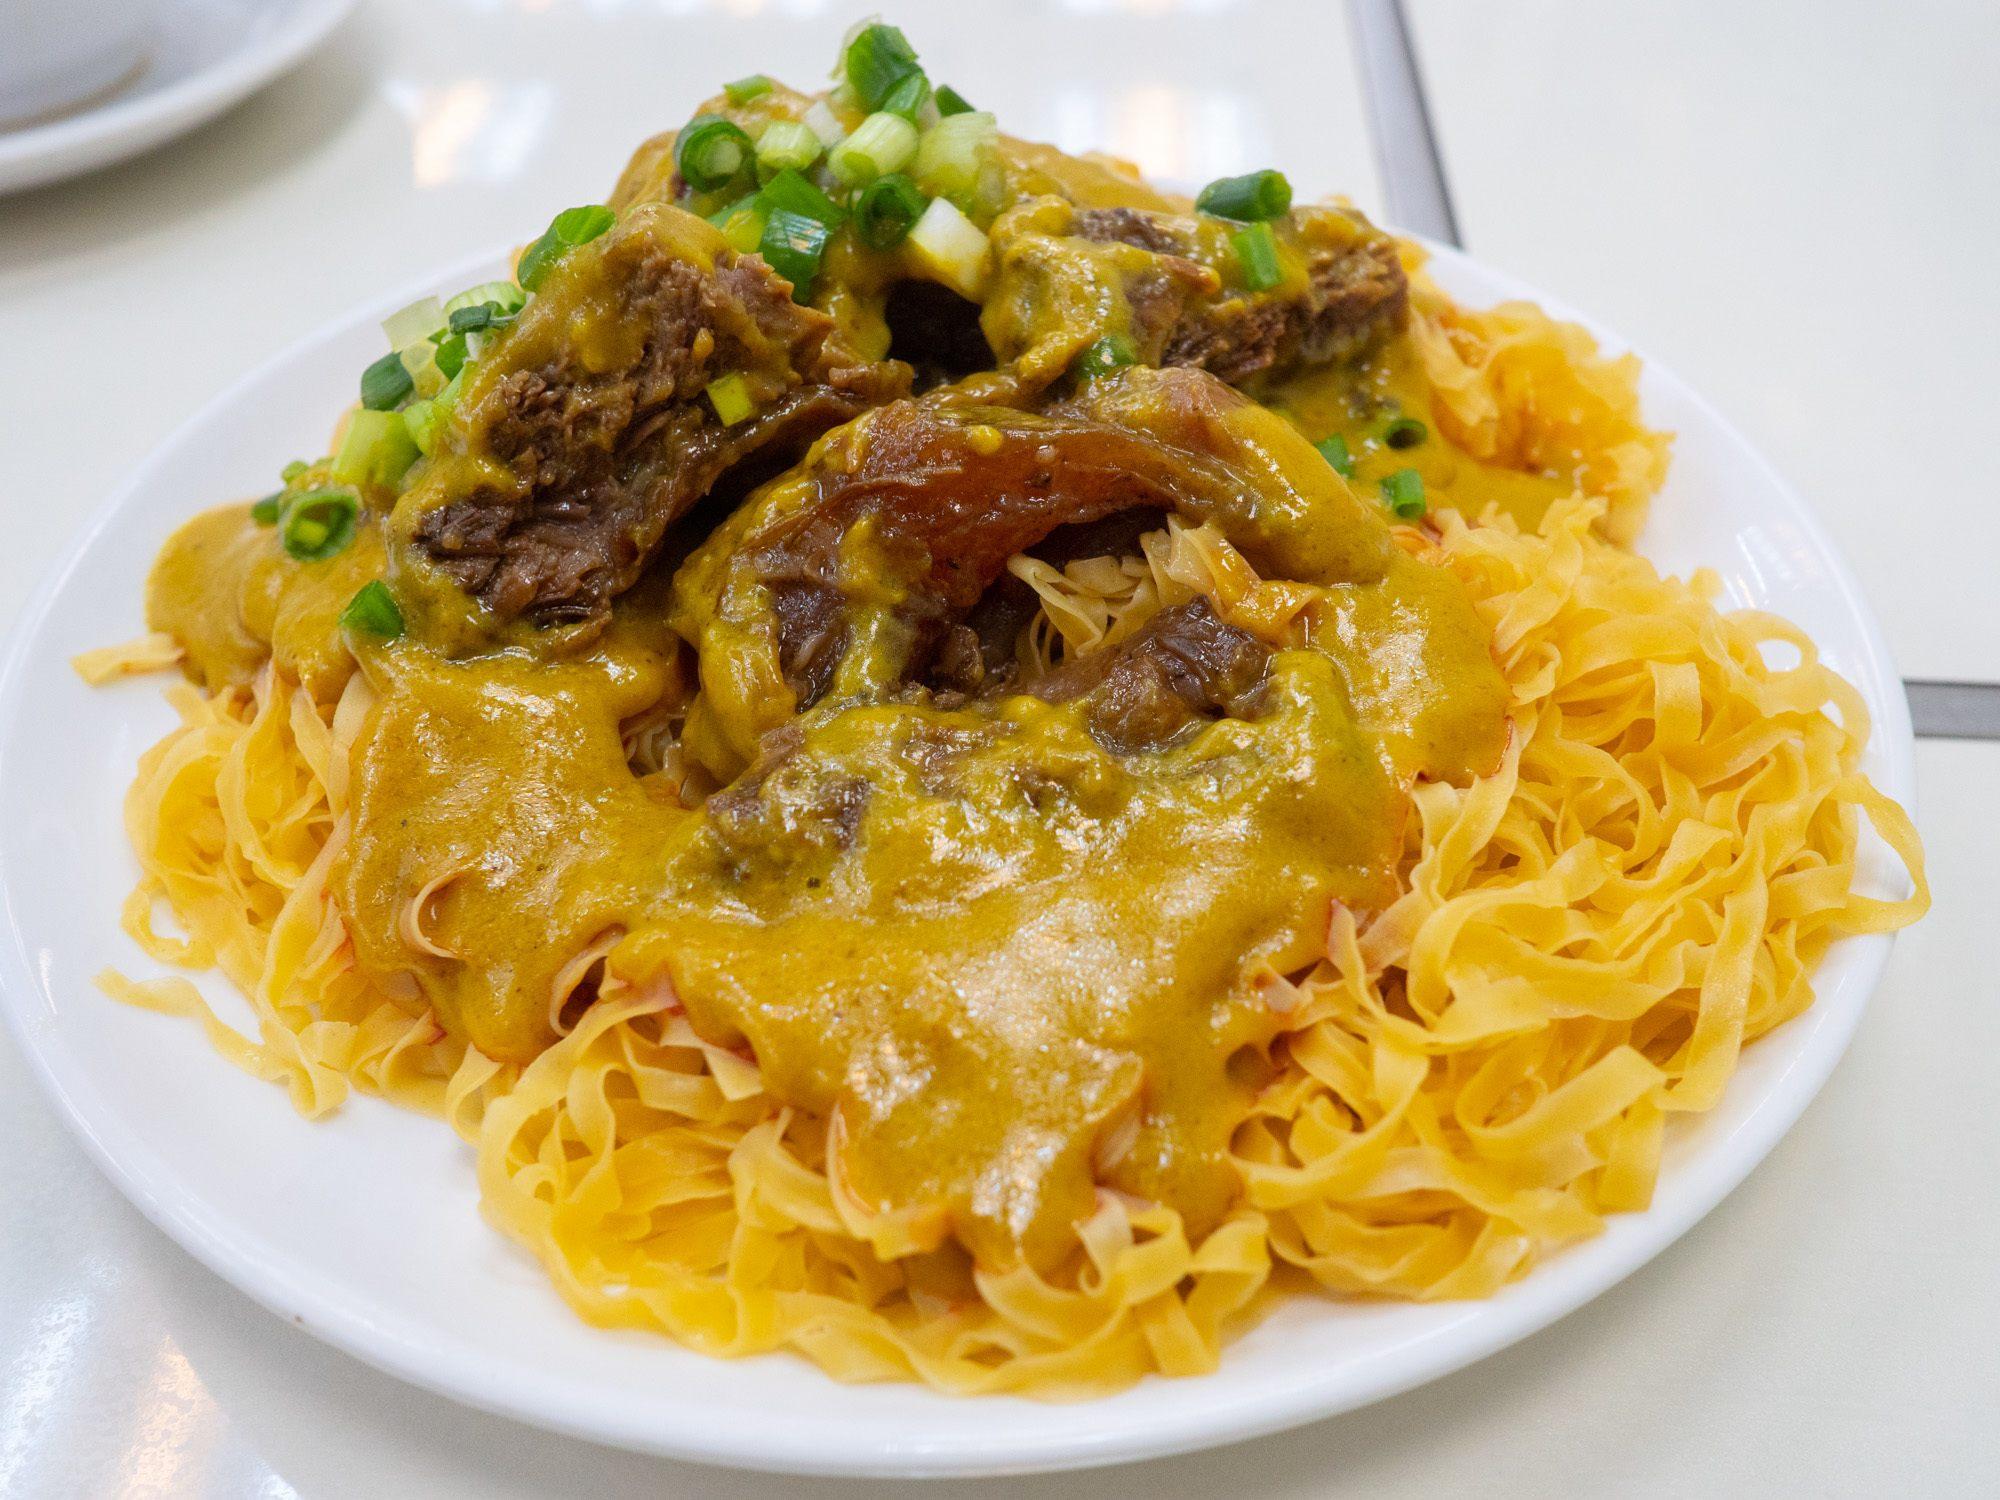 Beef curry brisket egg noodles at kun kei in kowloon, hong kong